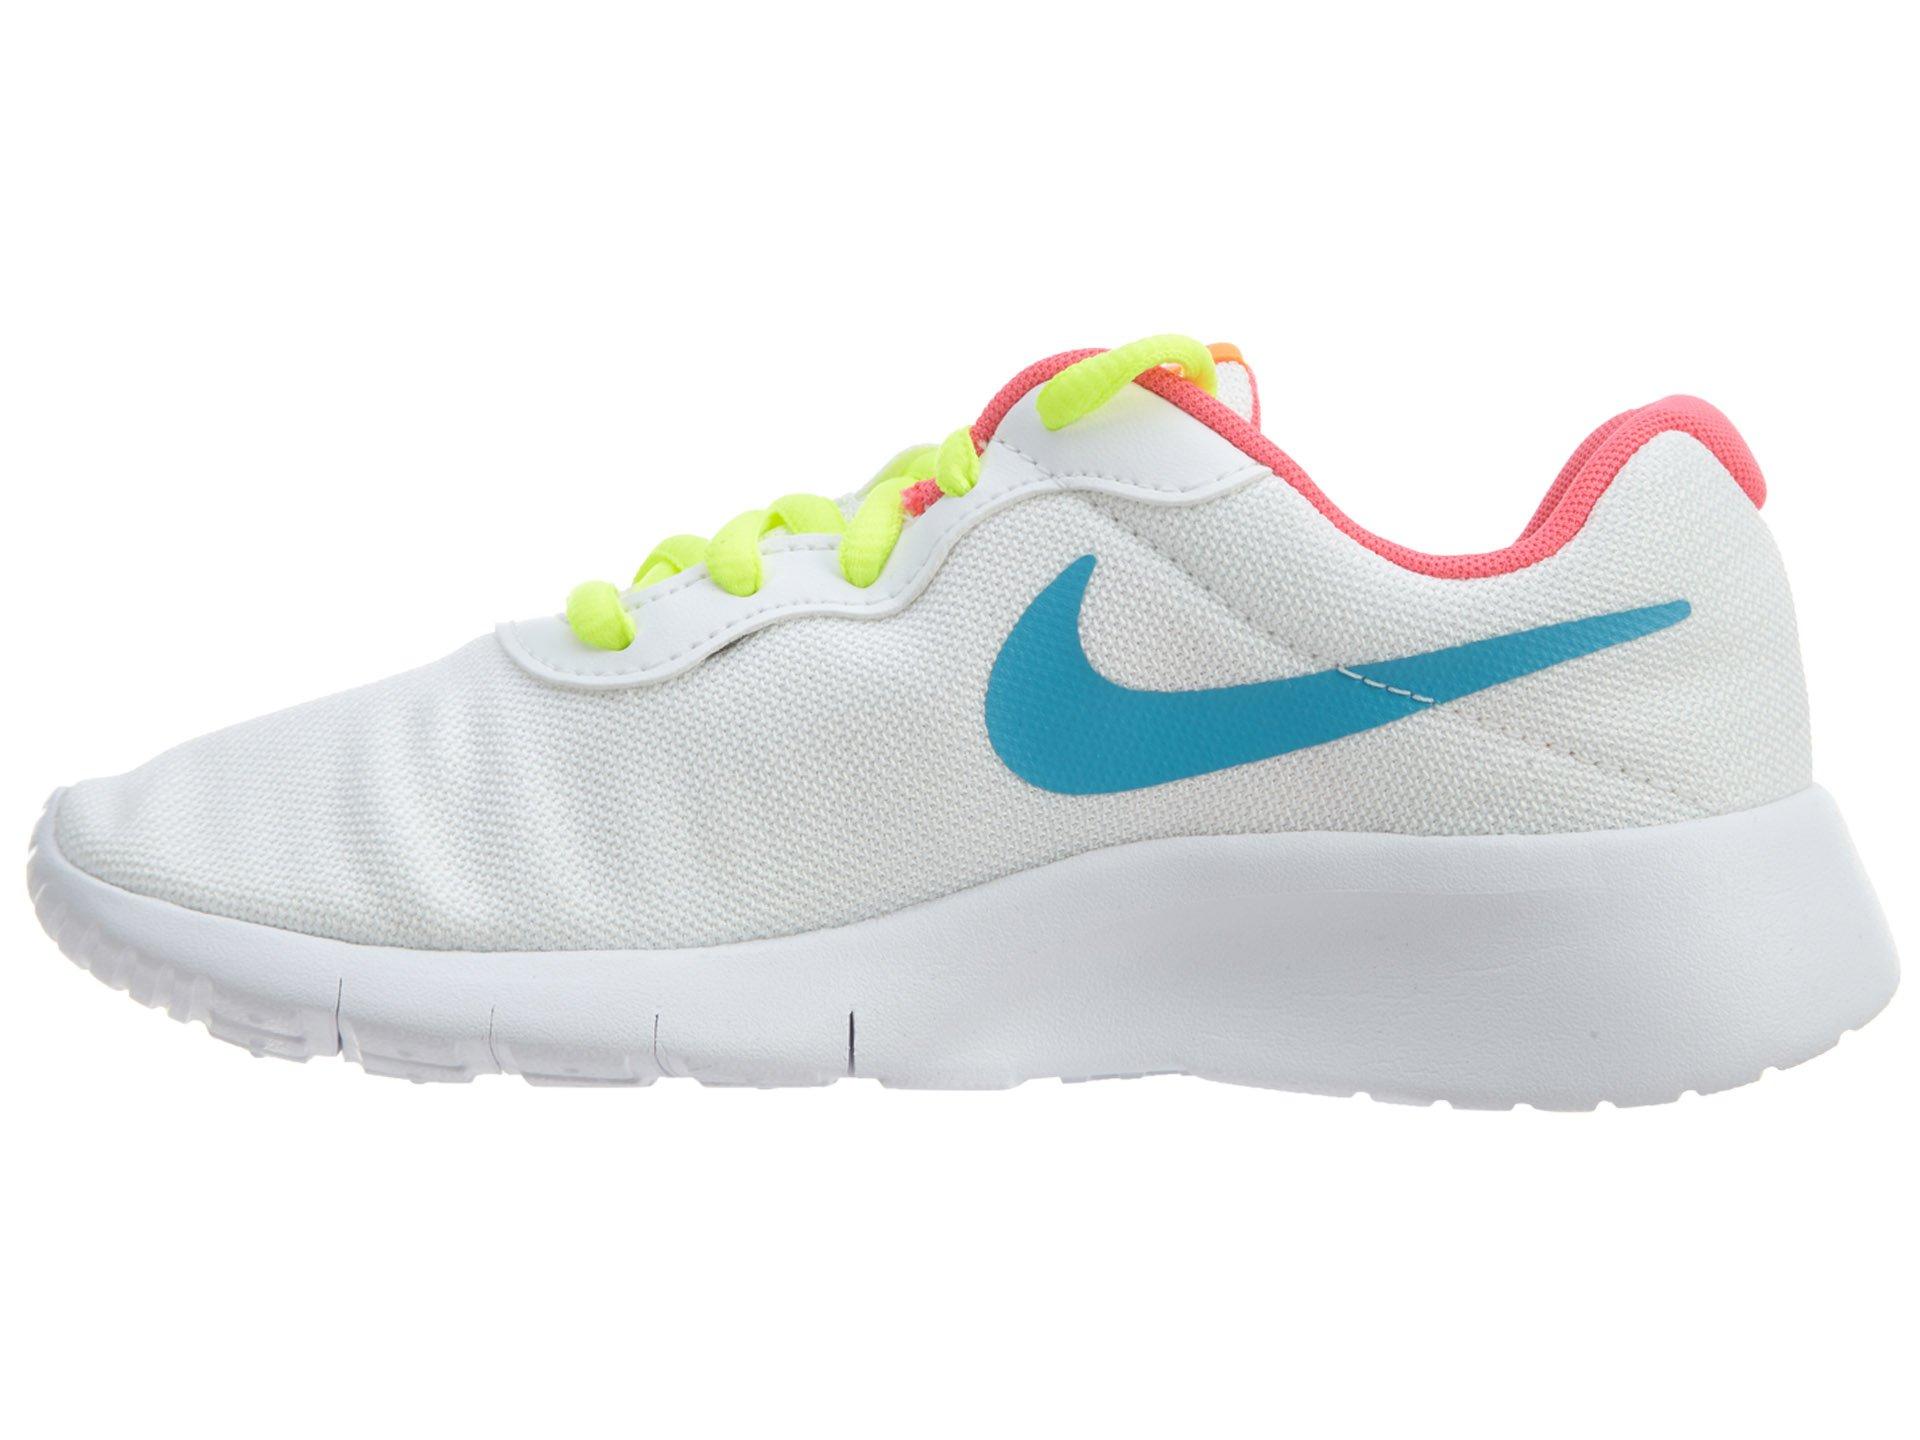 NIKE Tanjun Little Kids Style: 818385-100 Size: 1 by Nike (Image #4)